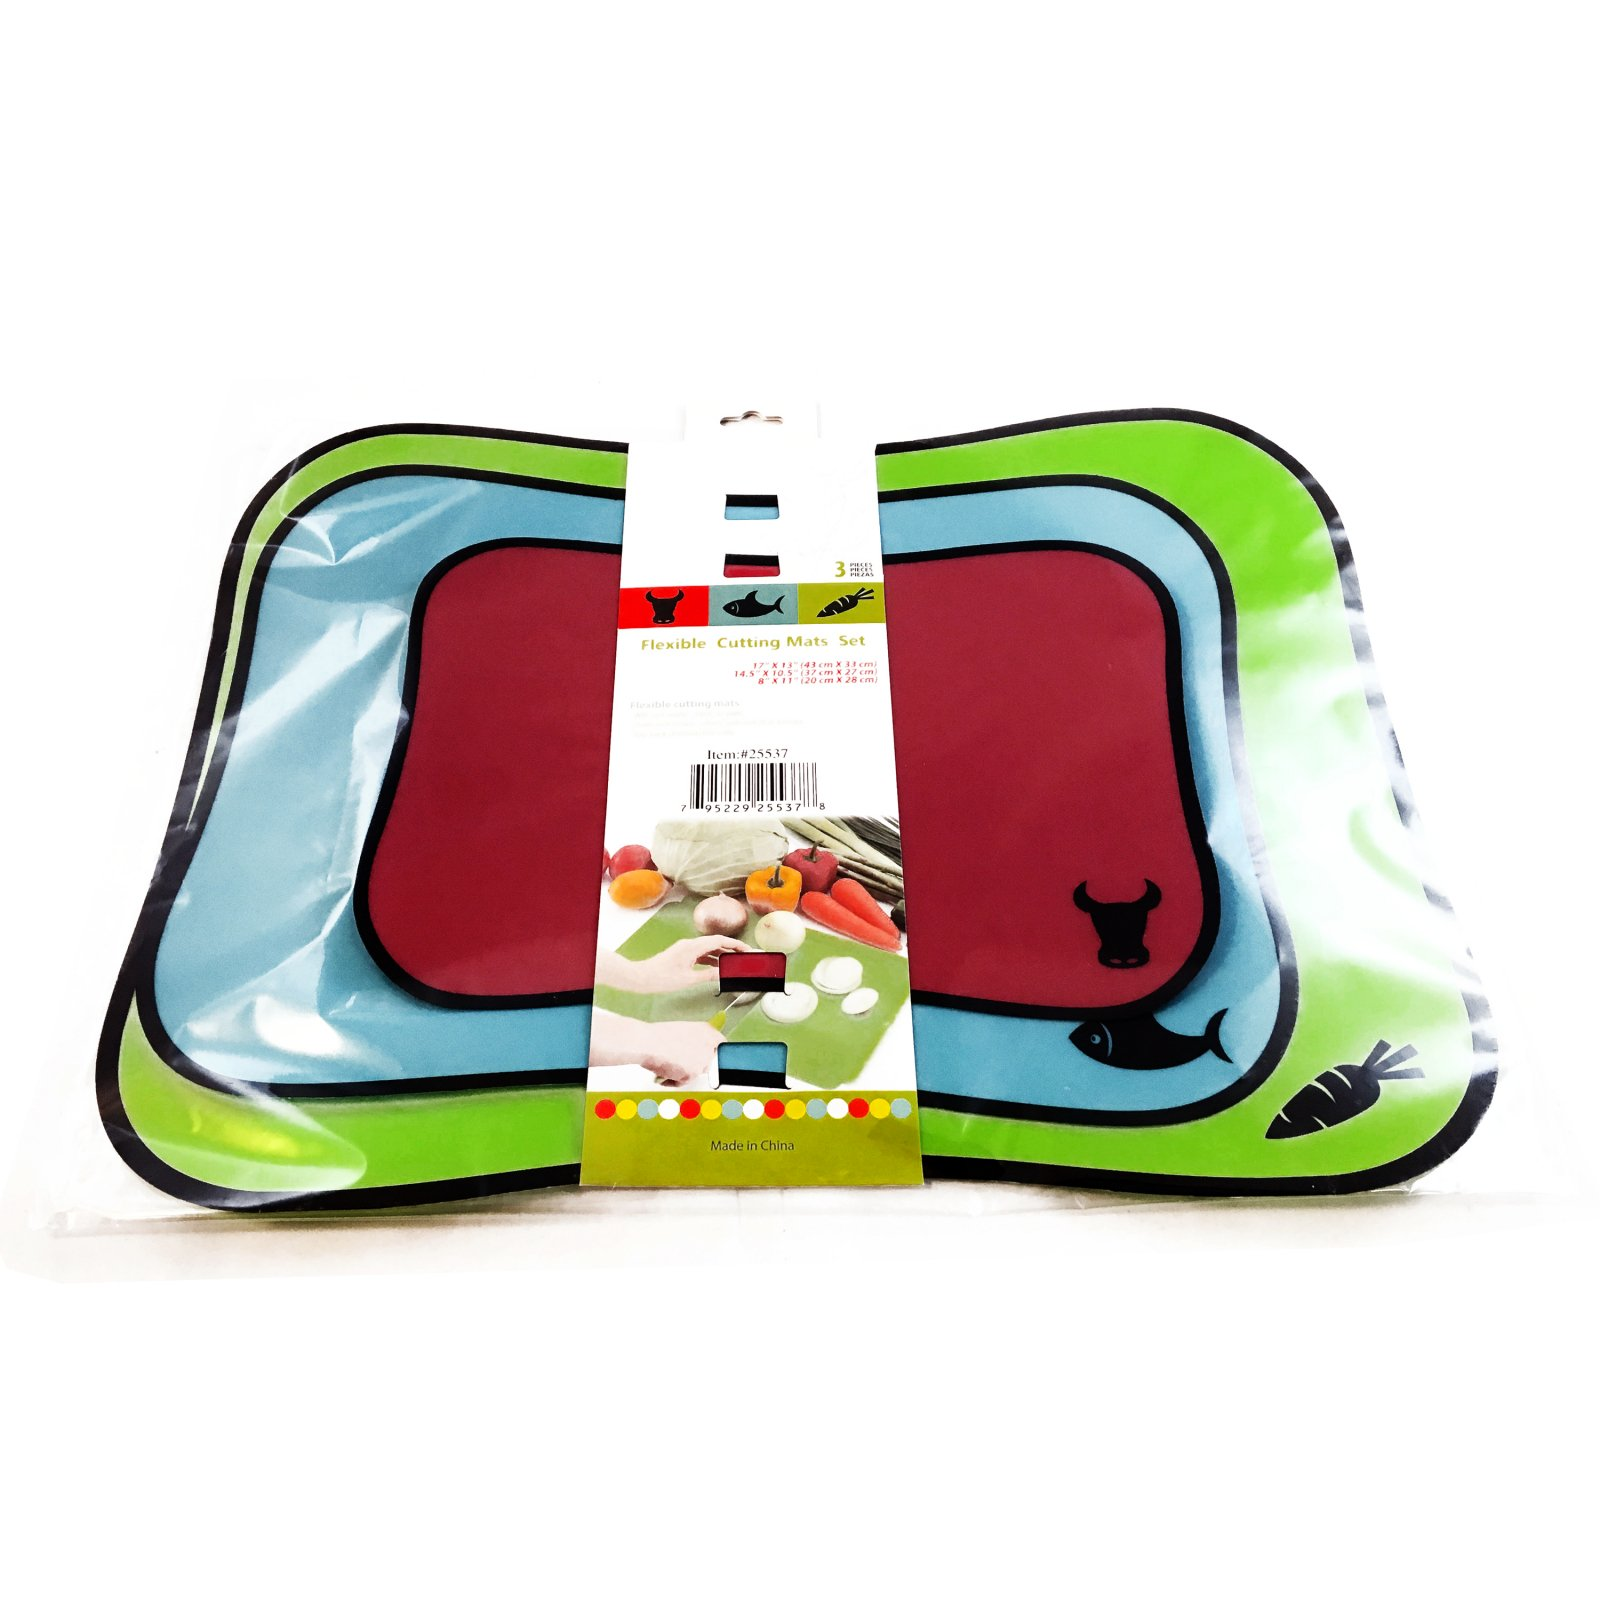 Universal Home Flexible Cutting Mat Kitchen Set No Warp Dishwasher Safe 3 Sizes